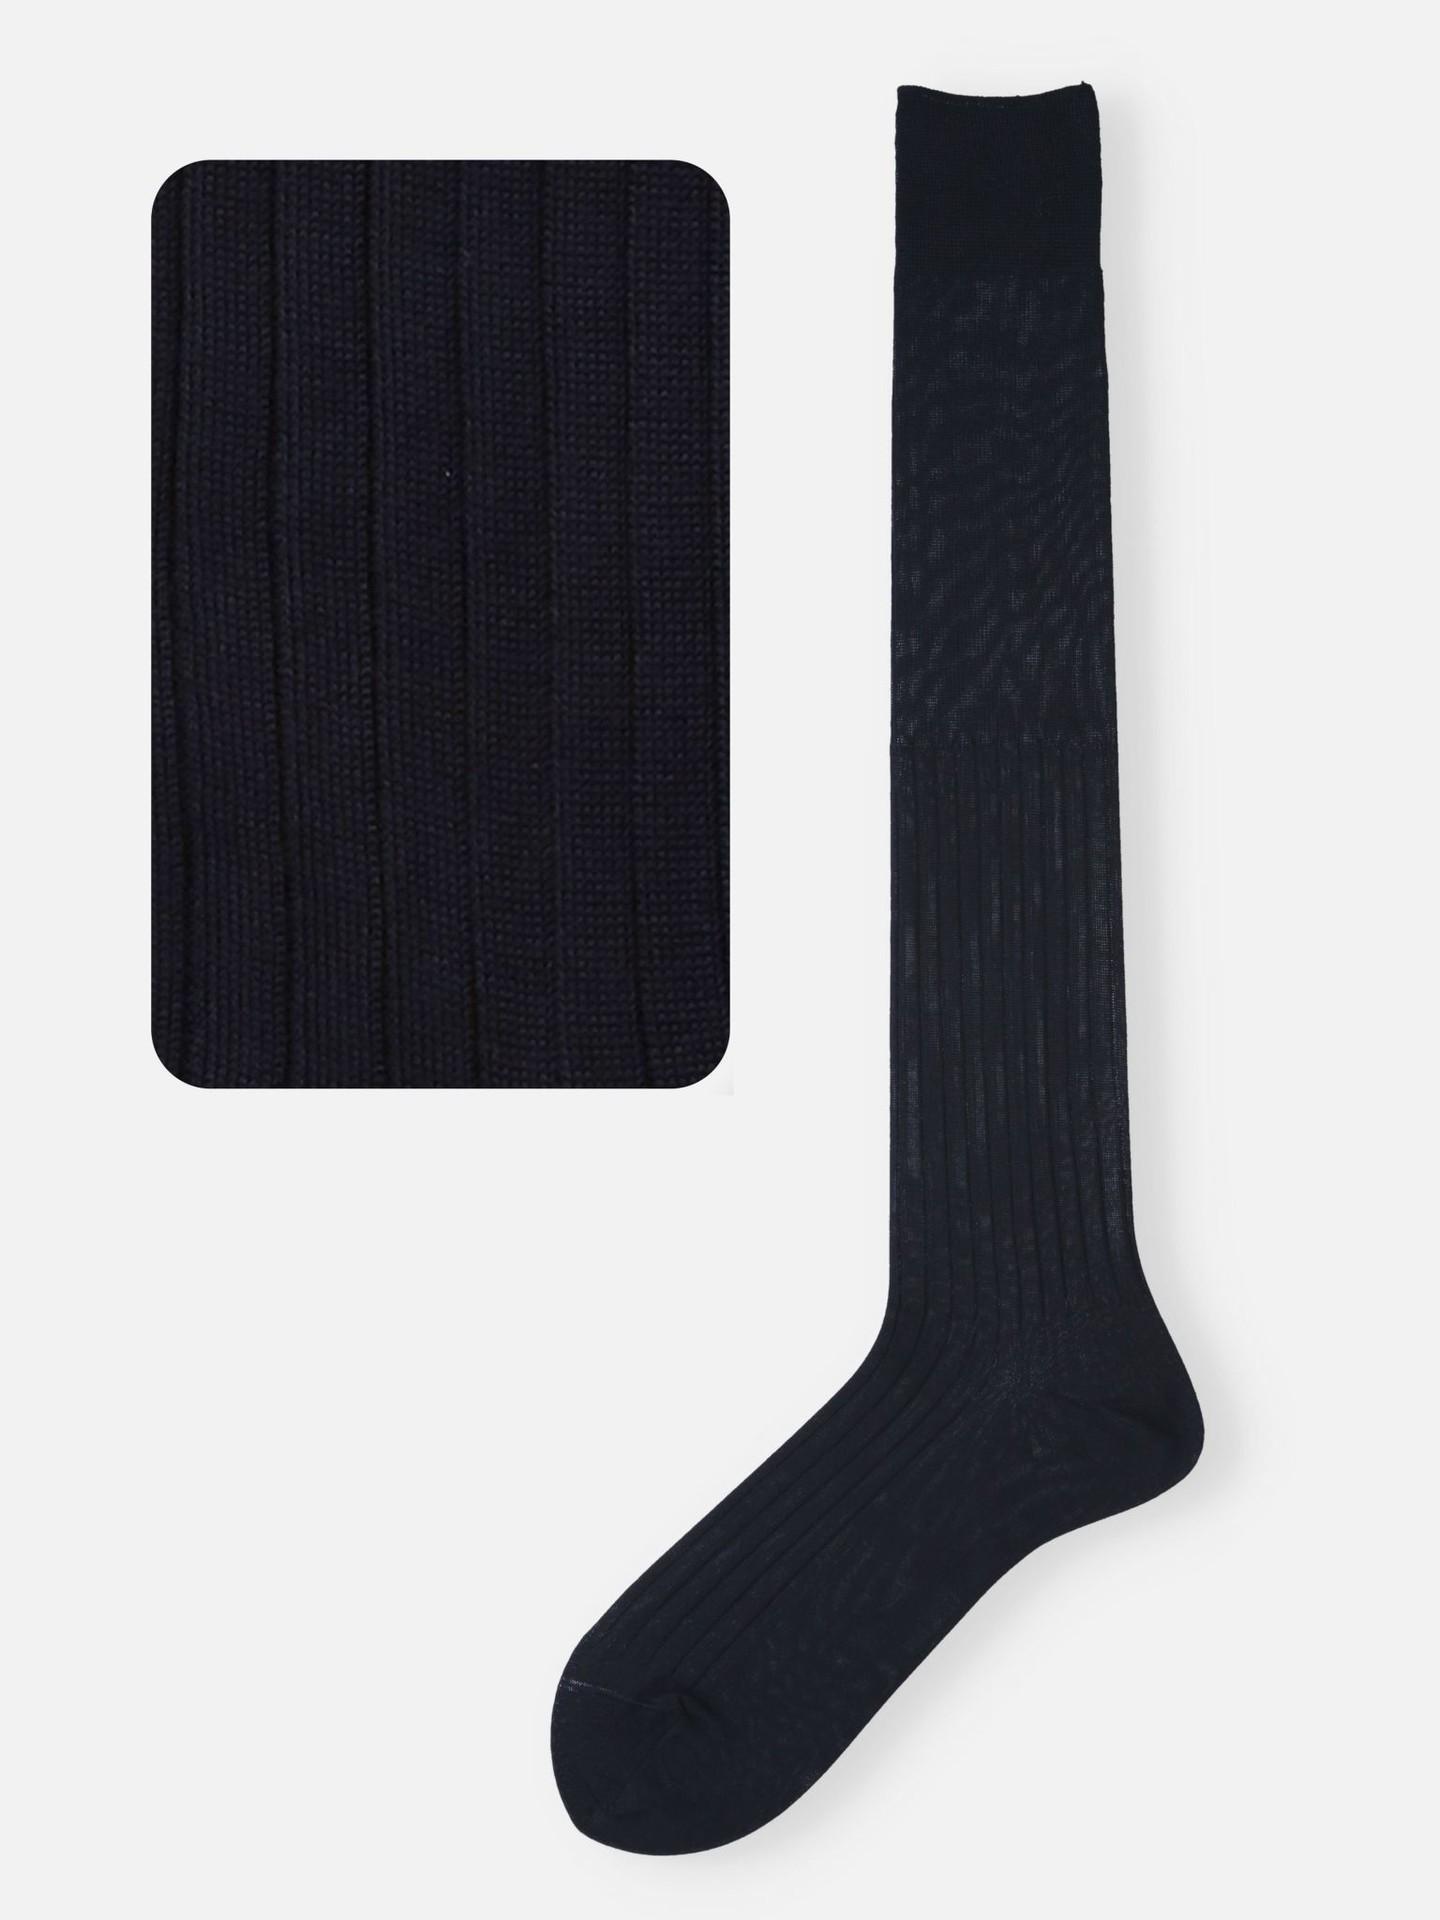 Hohe Socken in Nachtblau